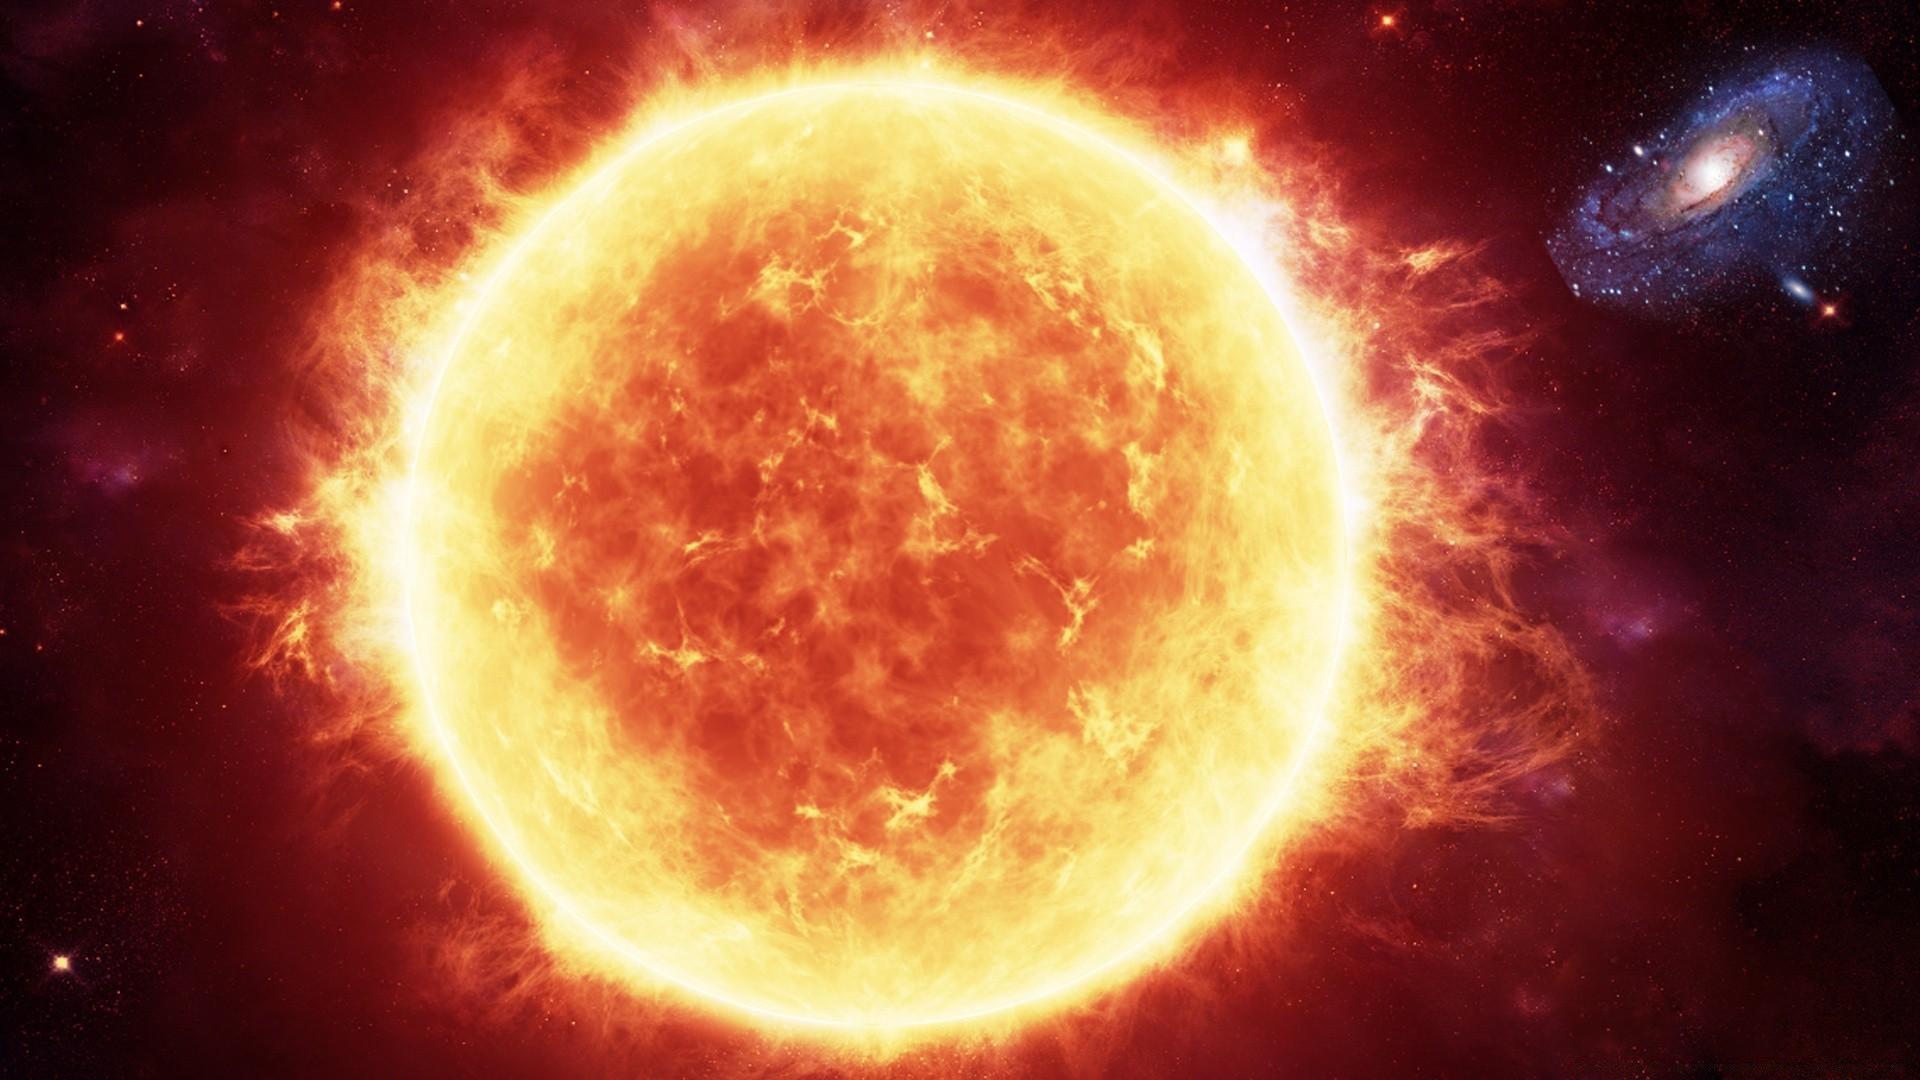 planets surrounding the sun - HD1920×1080